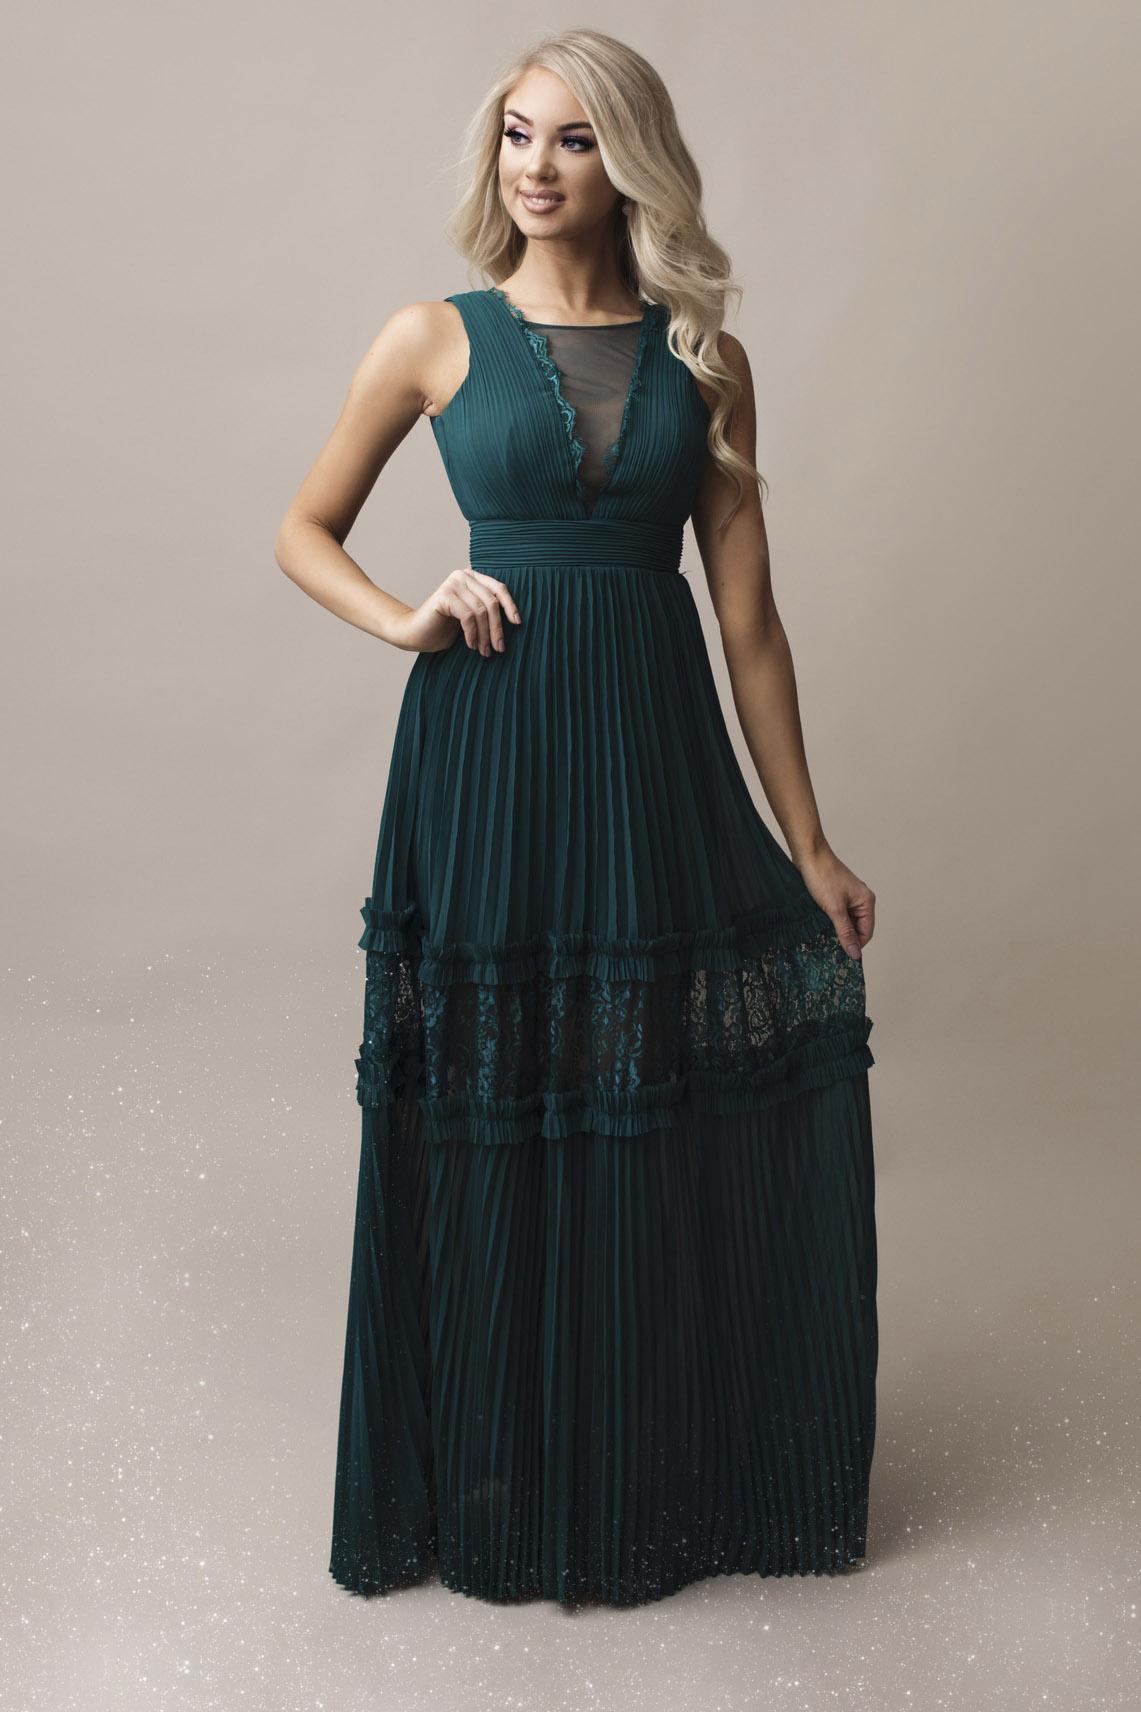 SENAT BOHO roheline kleit